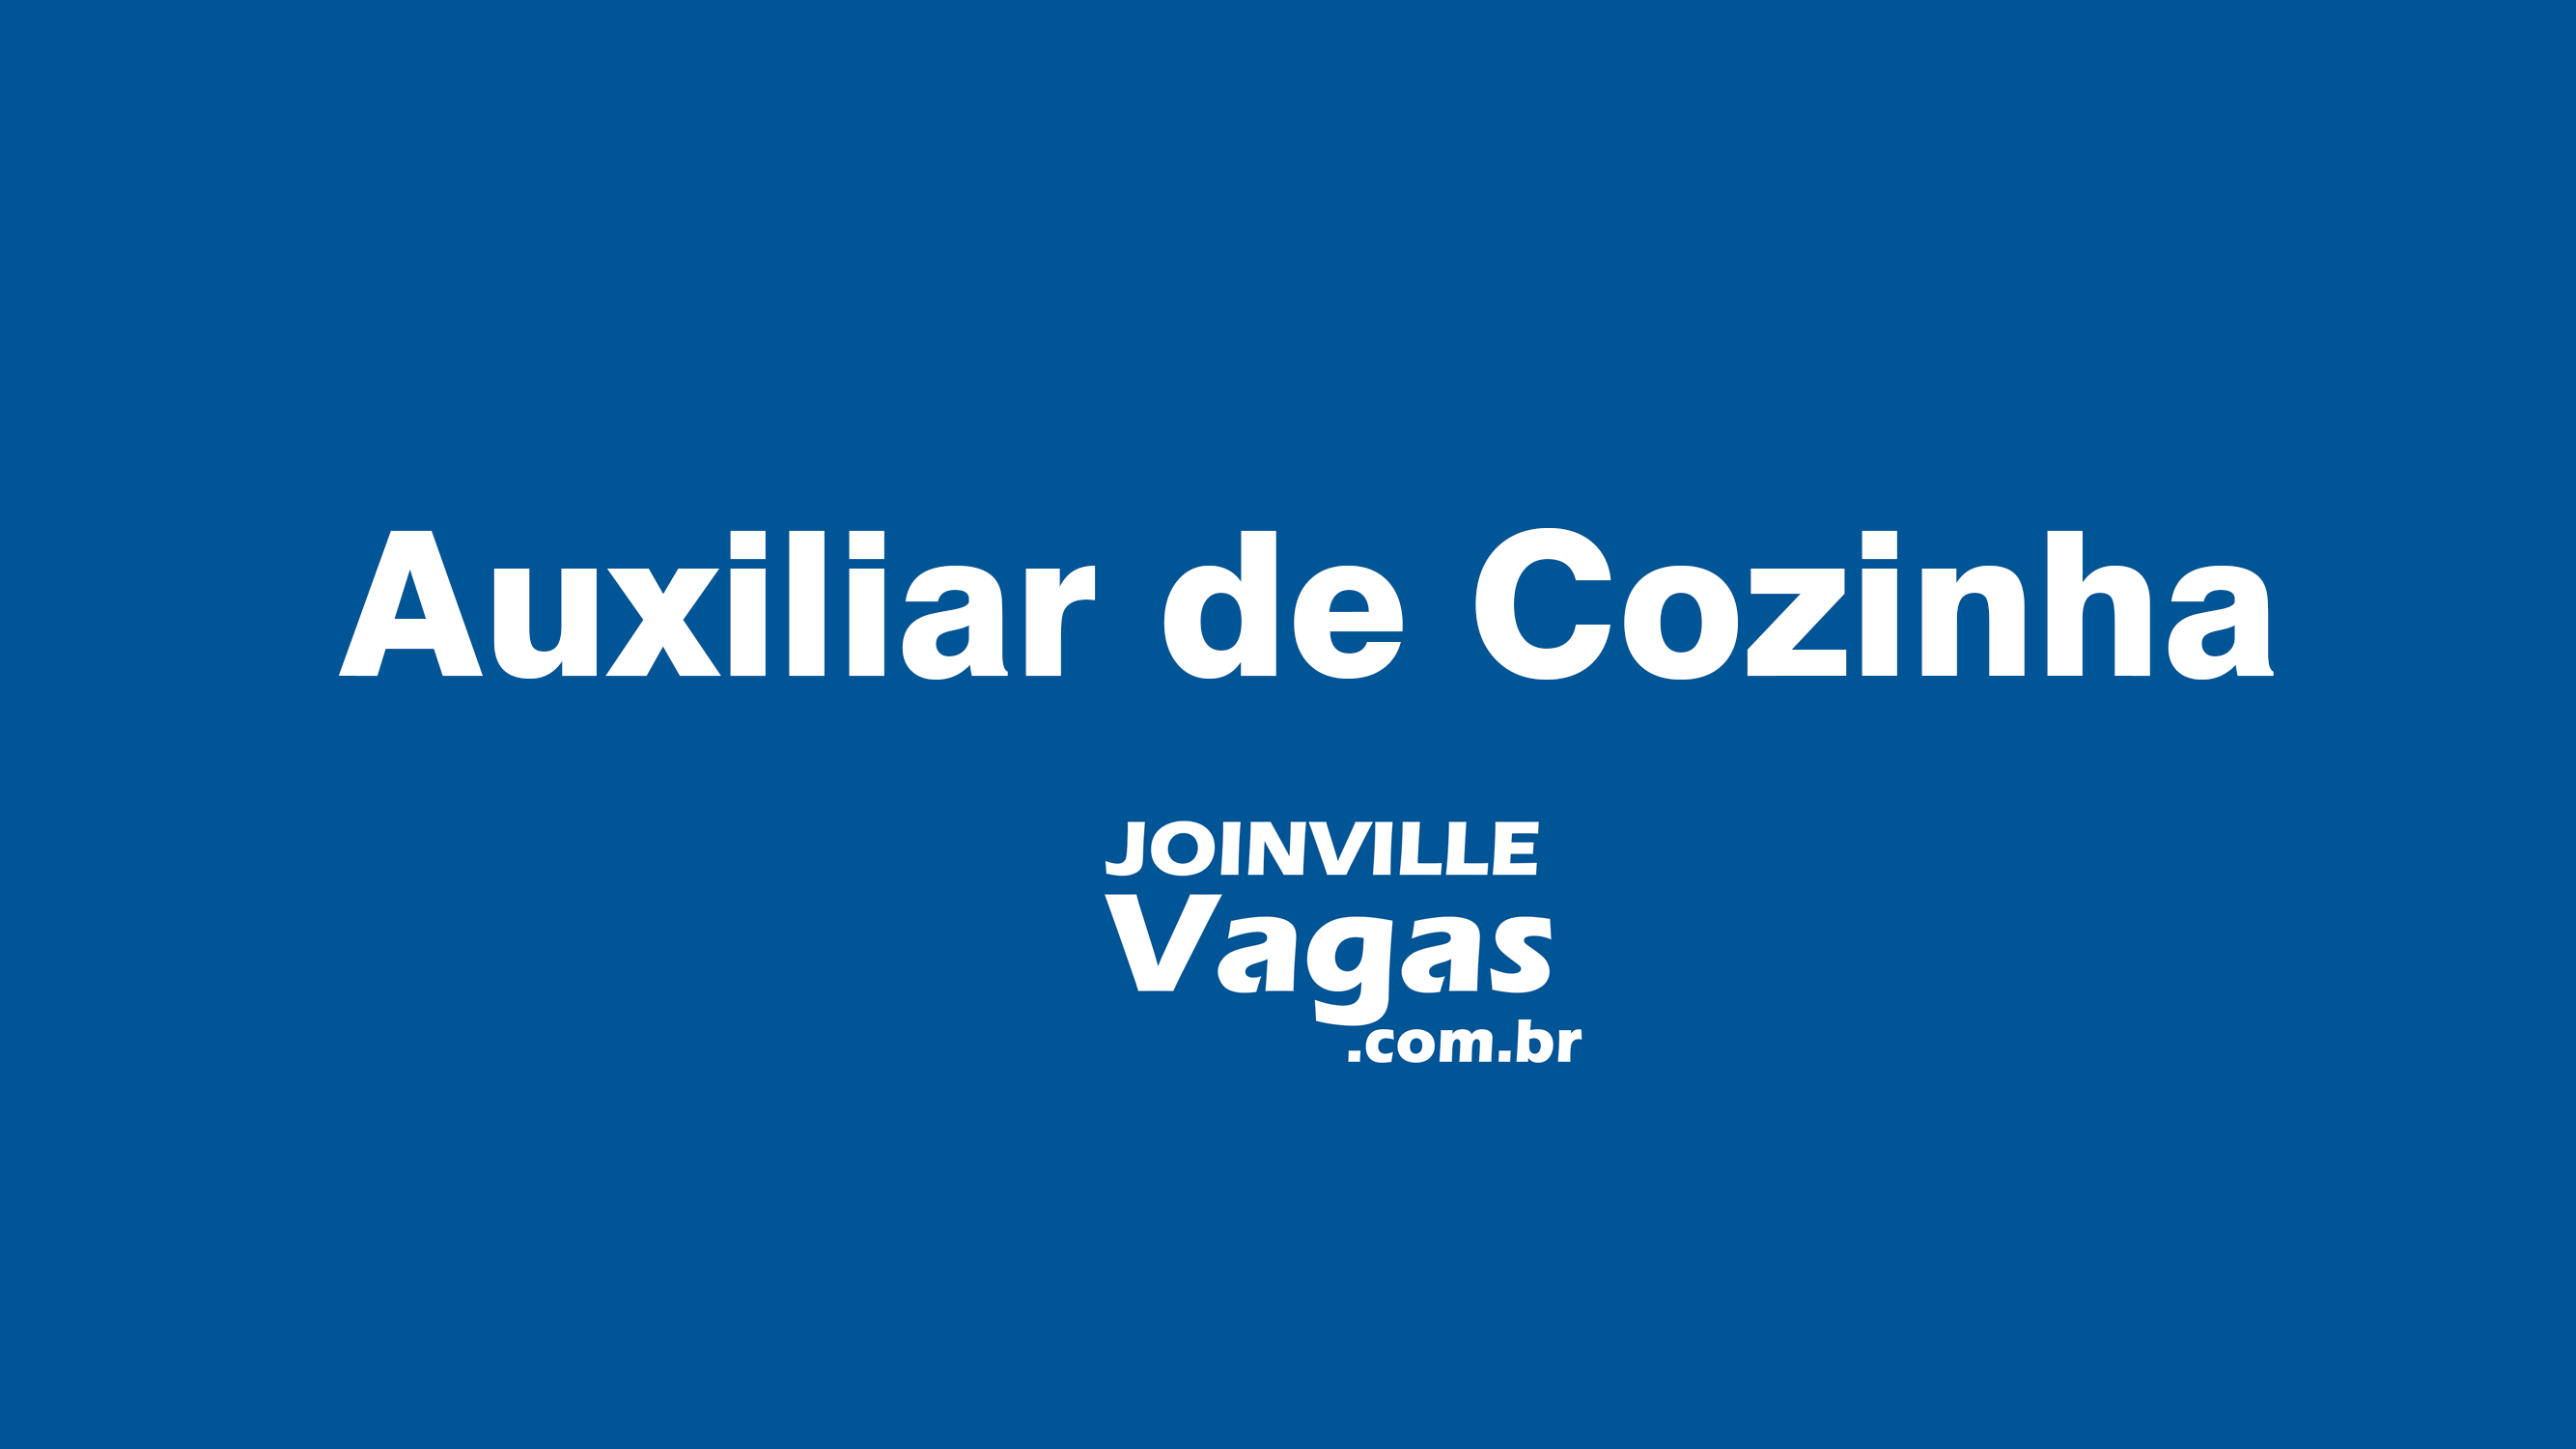 Auxiliar De Cozinha Copeira Joinville Vagas